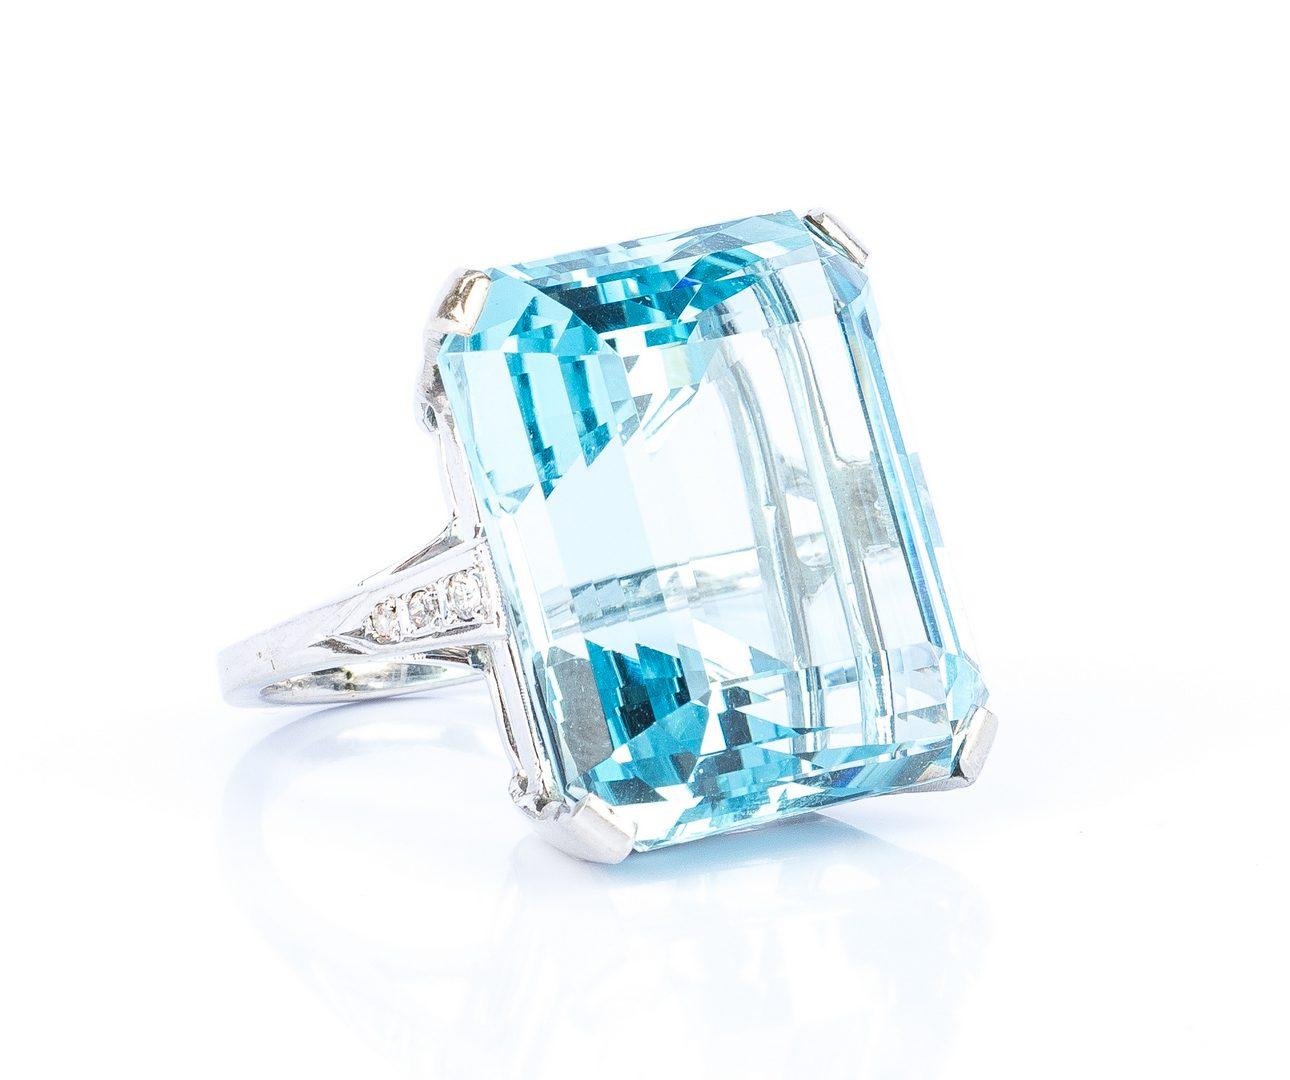 Lot 43: H. Stern 44 ct. Aquamarine & Dia. Ring, GIA